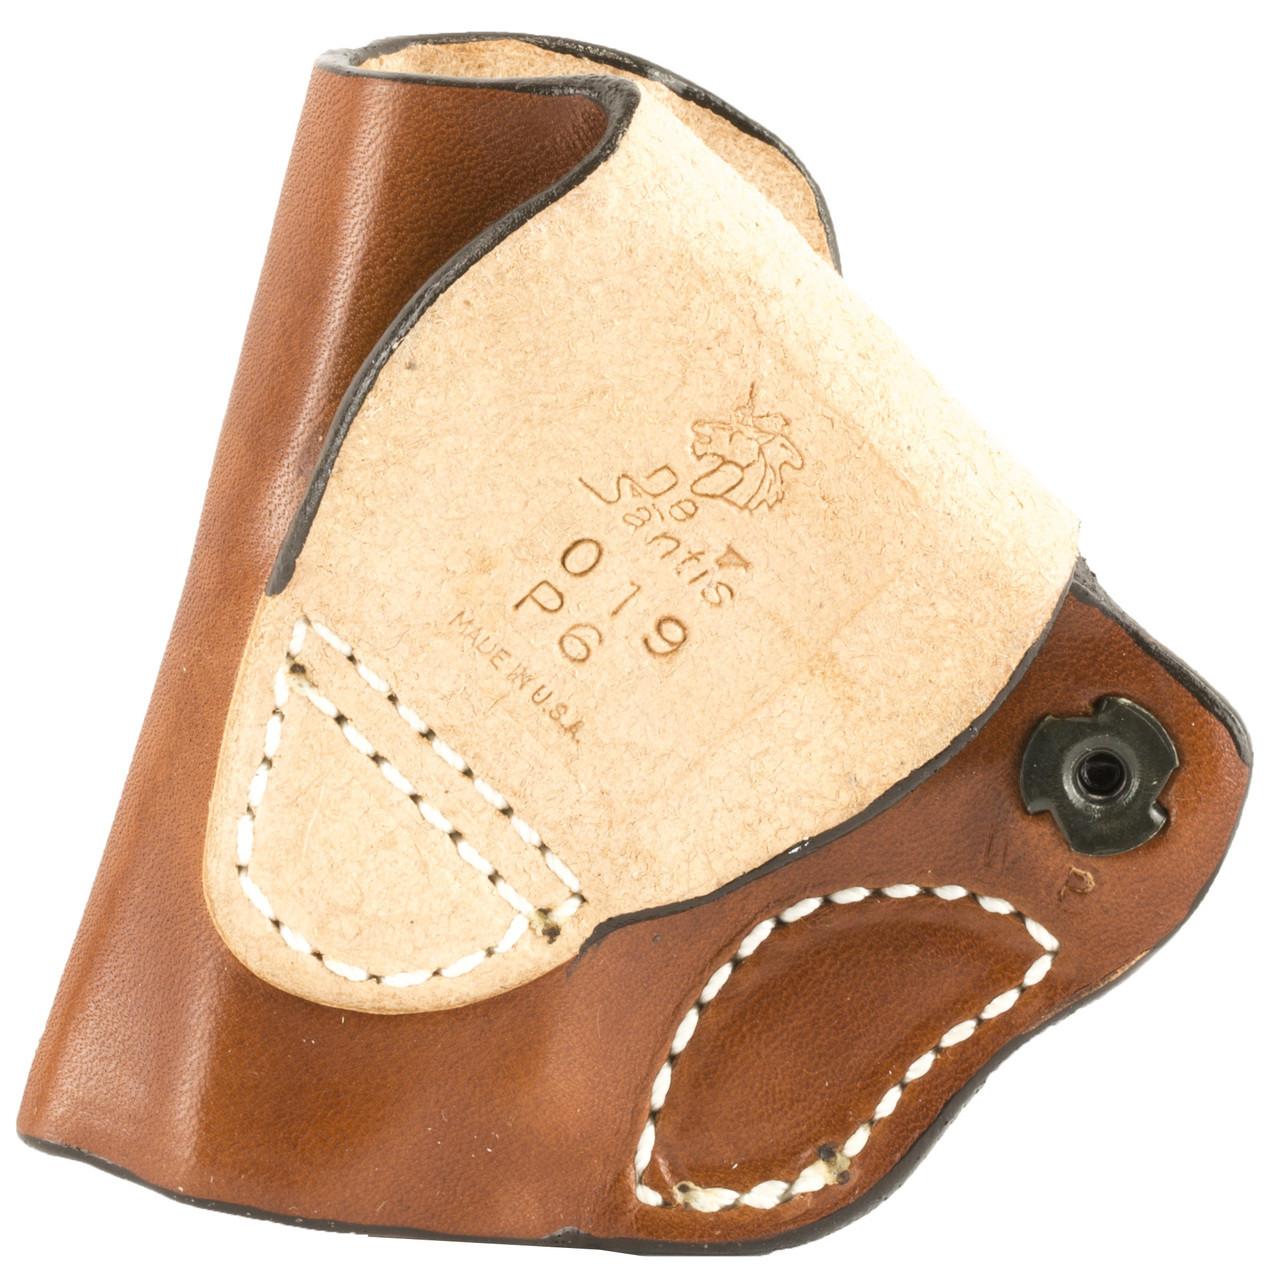 Desantis 019TAP6Z0 Mini Scabbard Sig Sauer P238 Belt Holster RH Tan